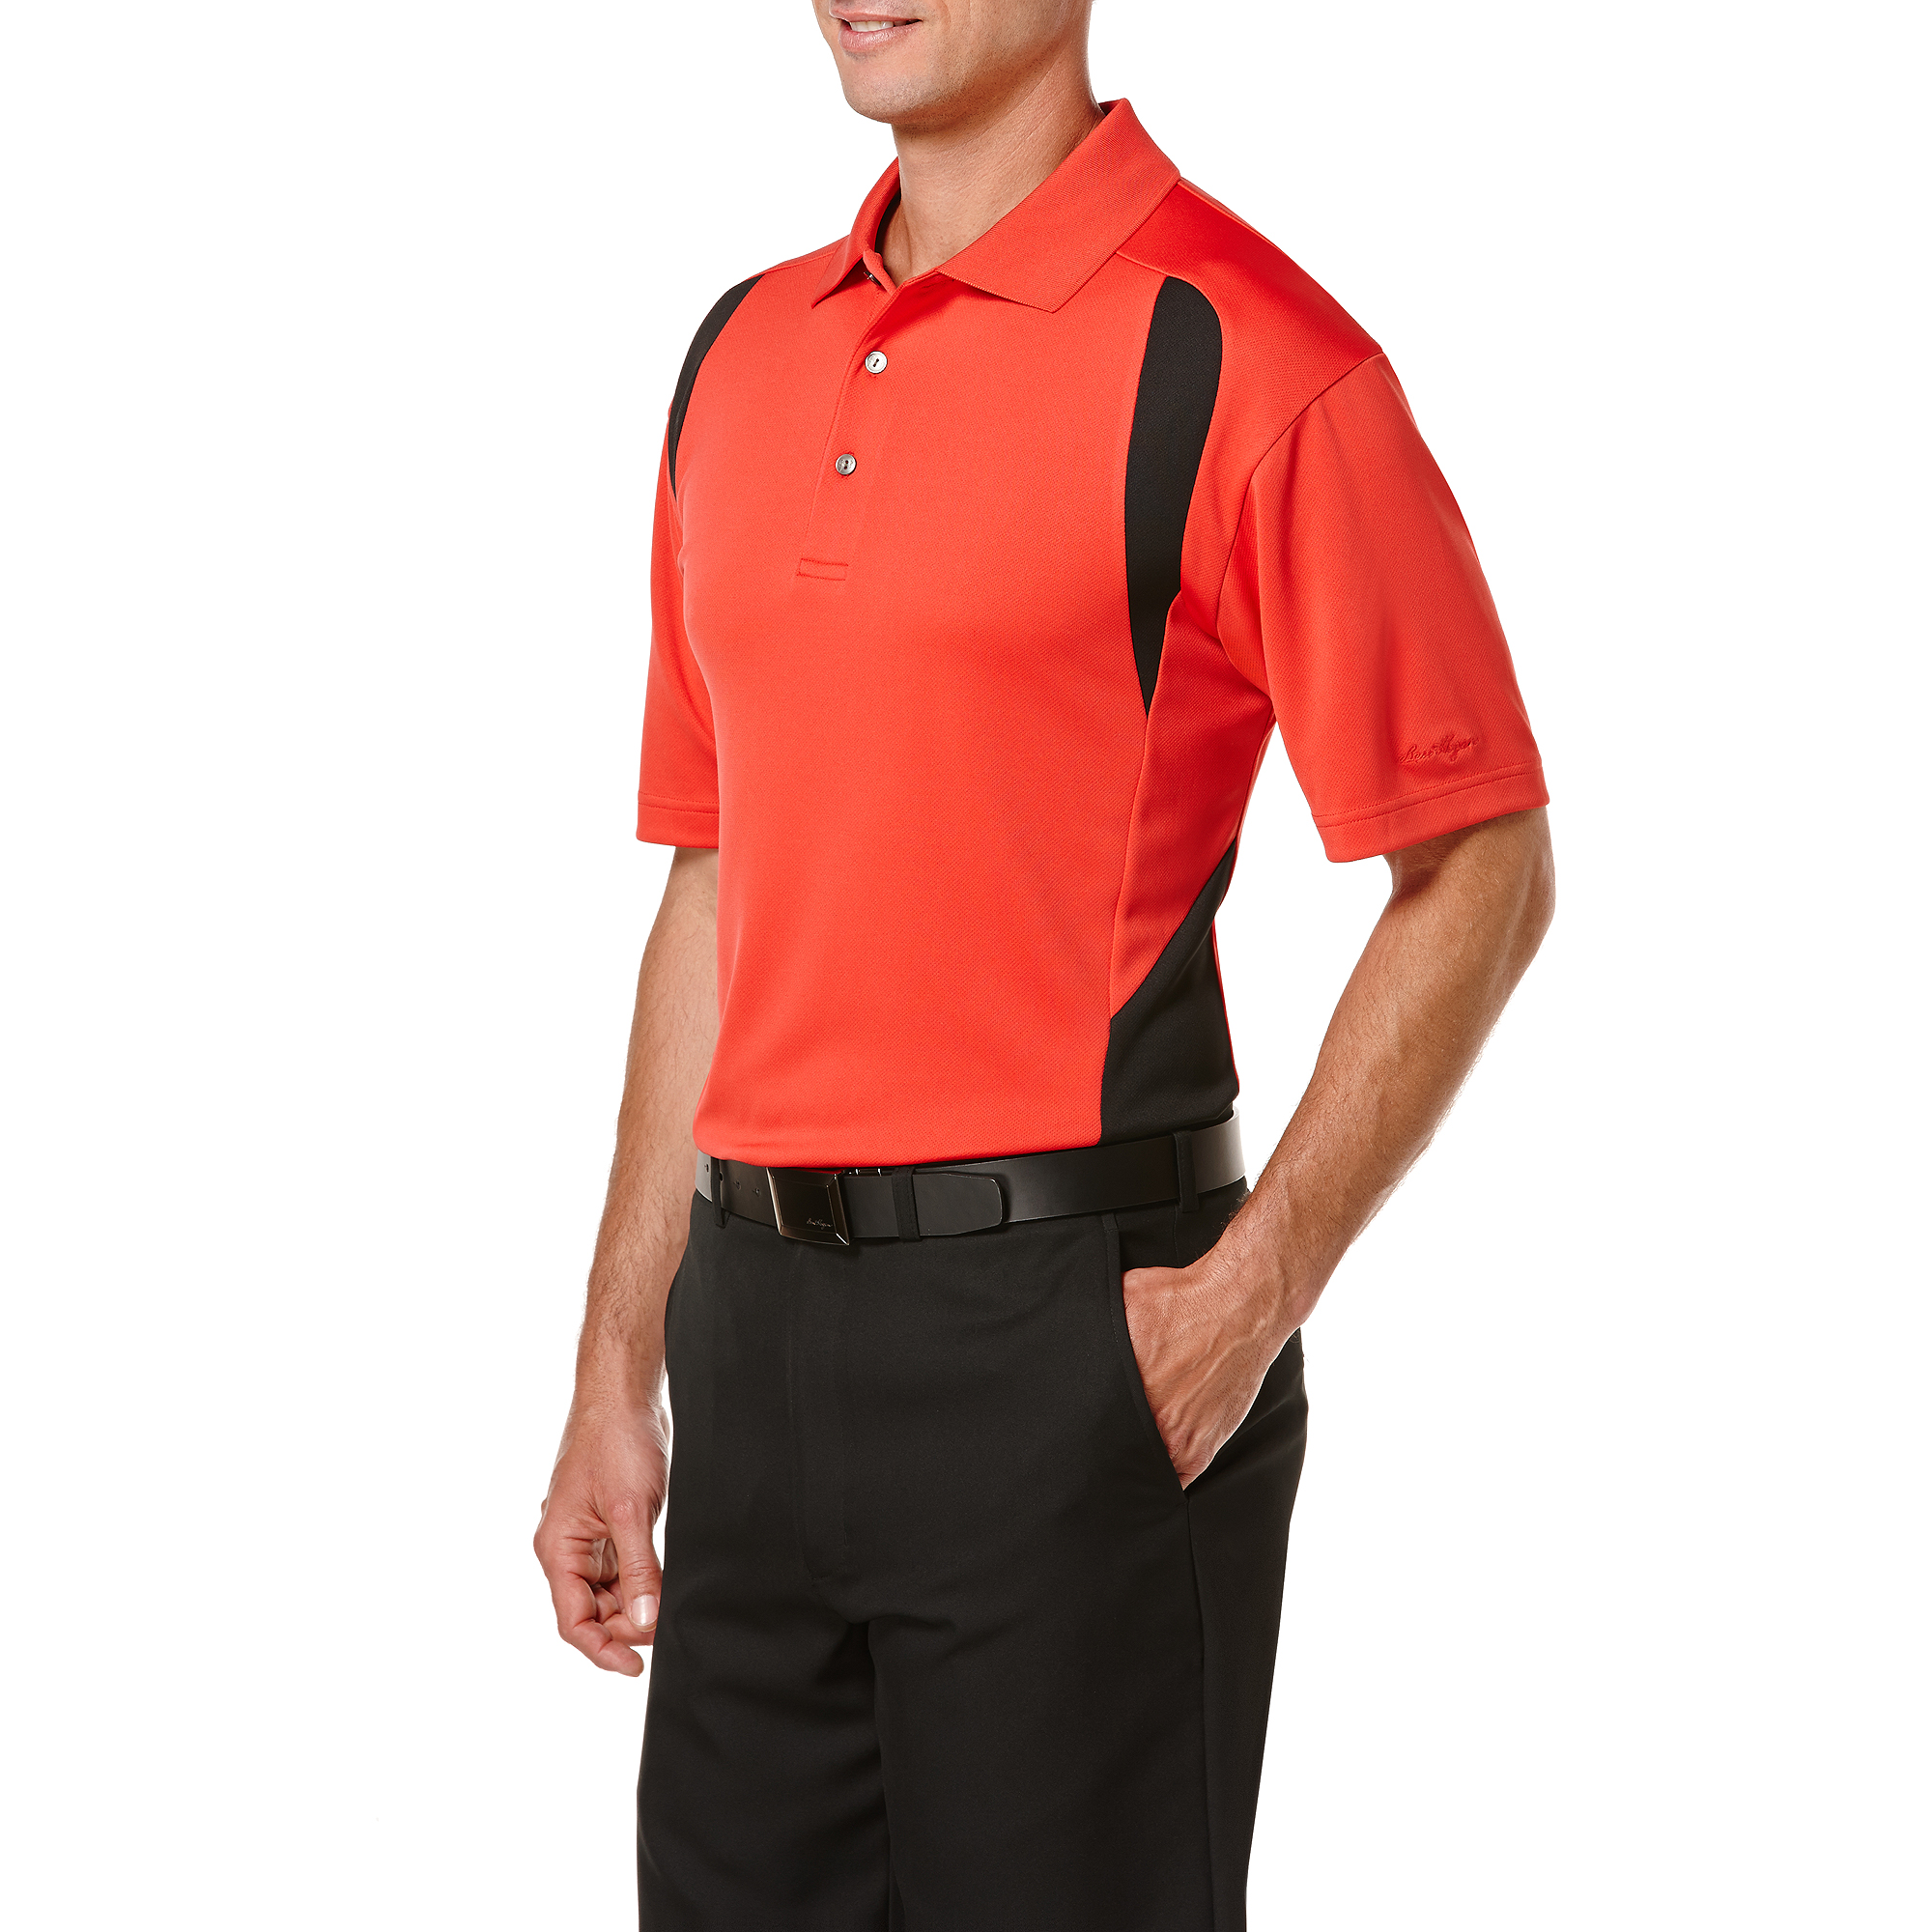 Ben Hogan Performance Big Men's Colorblock Short Sleeve Polo Shirt